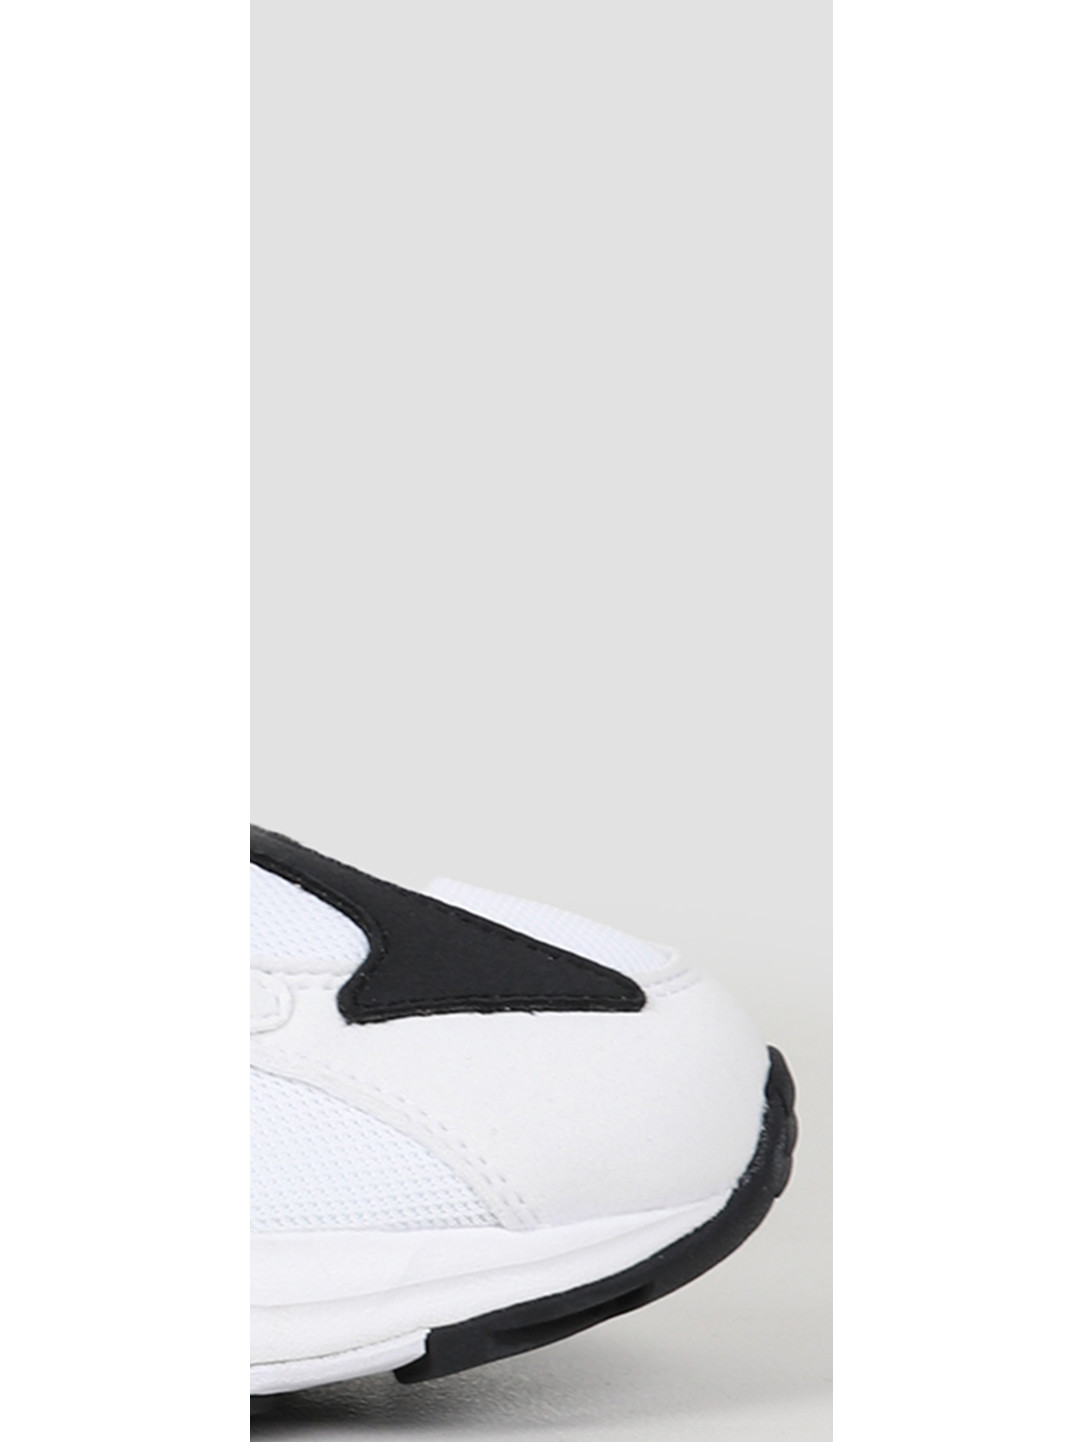 Reebok Reebok Aztrek 96 White Rapid Teal Bla DV6757